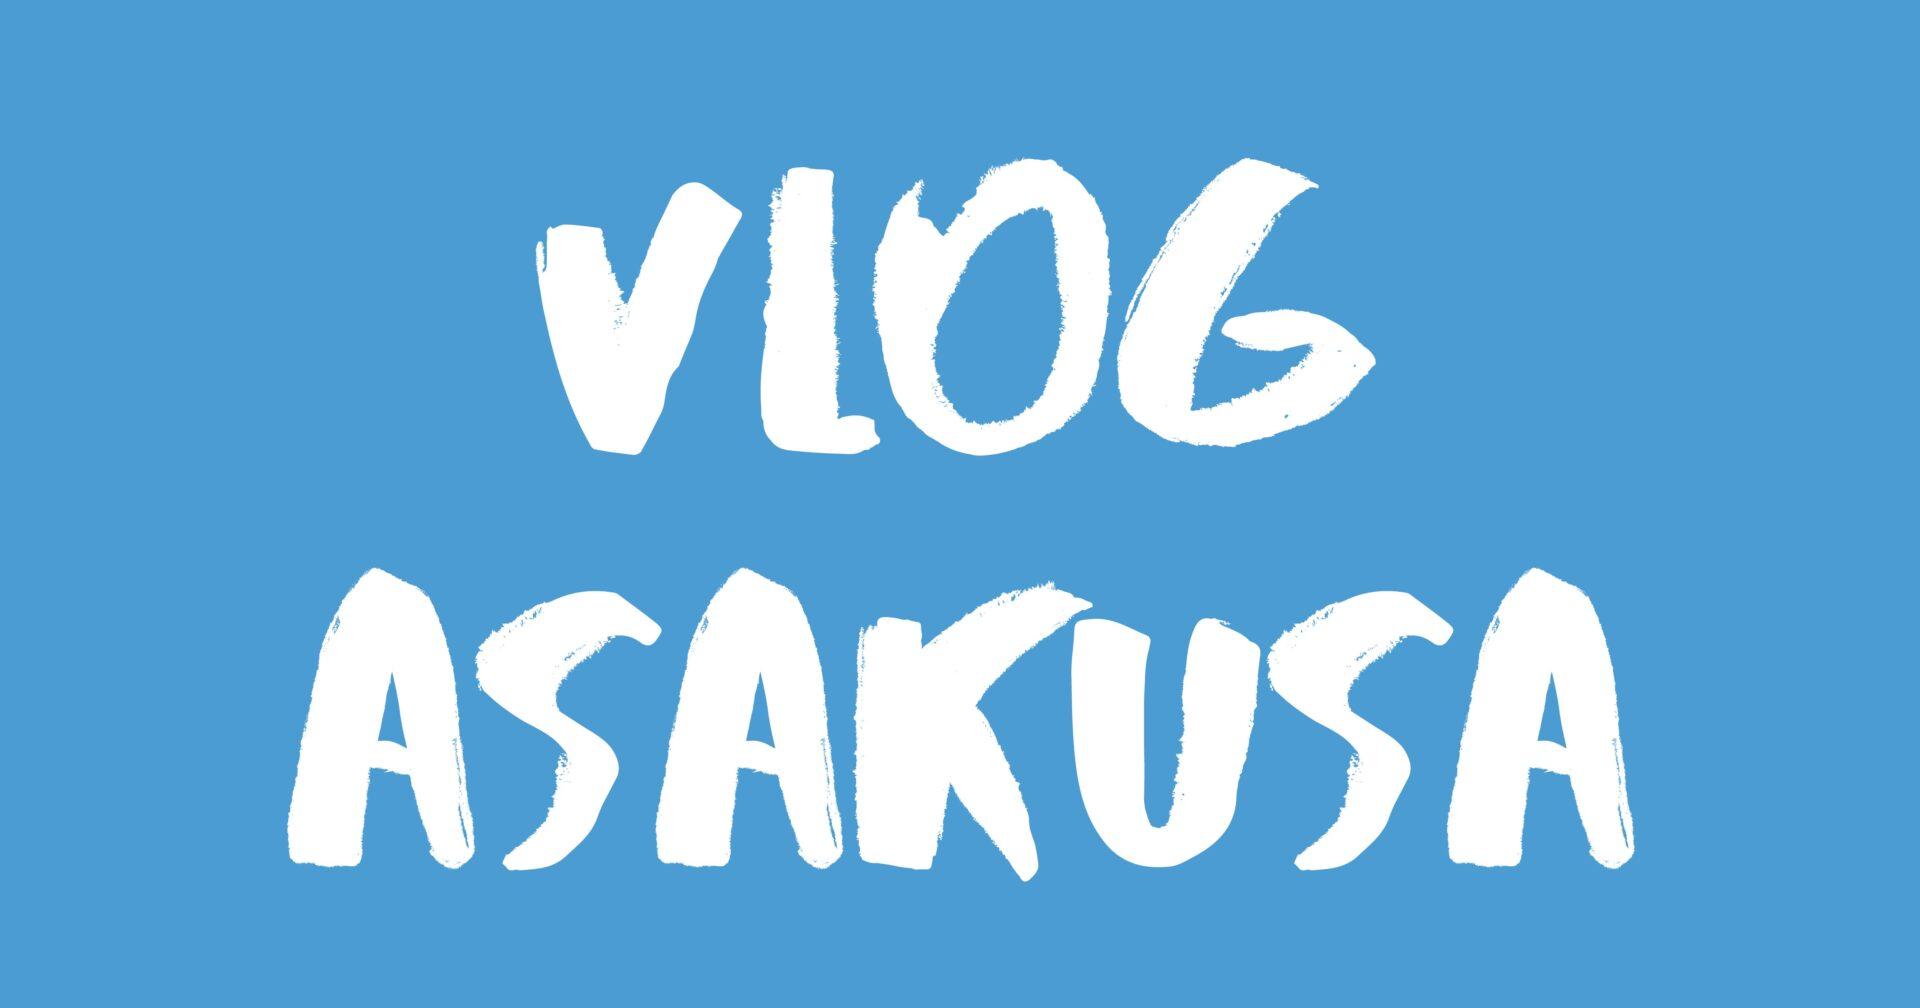 [Vlog] 浅草 / Asakusa